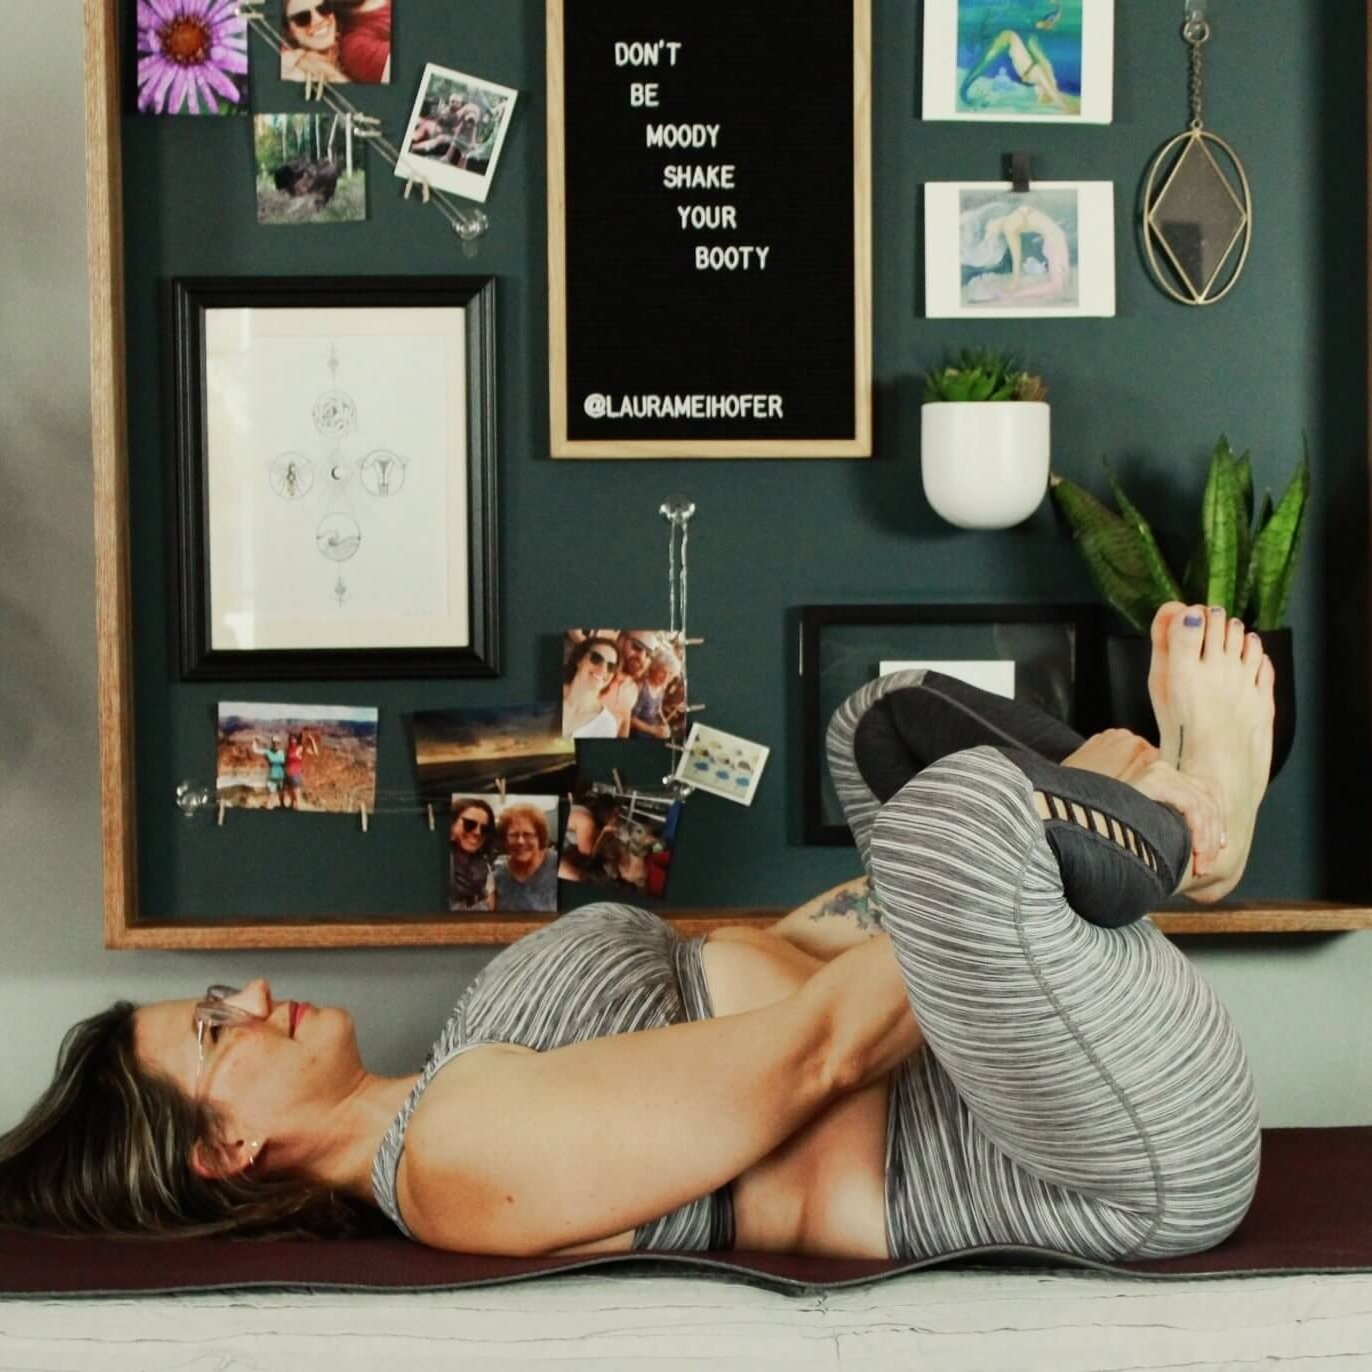 bound angle yoga pose laura meihofer modification6 variation6 e1613095285108